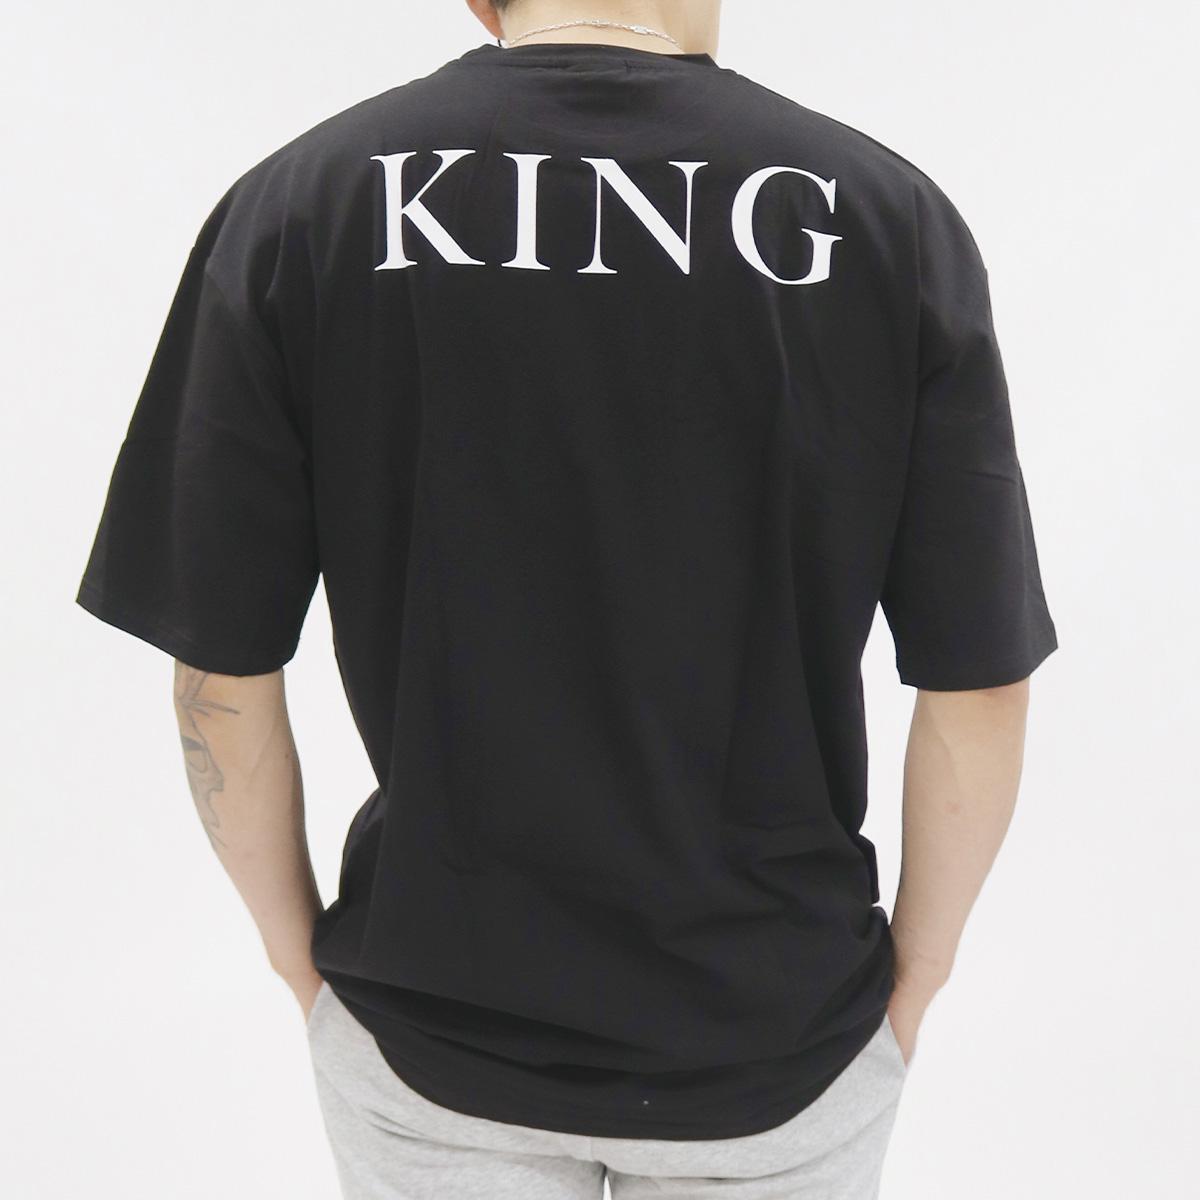 OVERSIZE KING TEE - BLACK